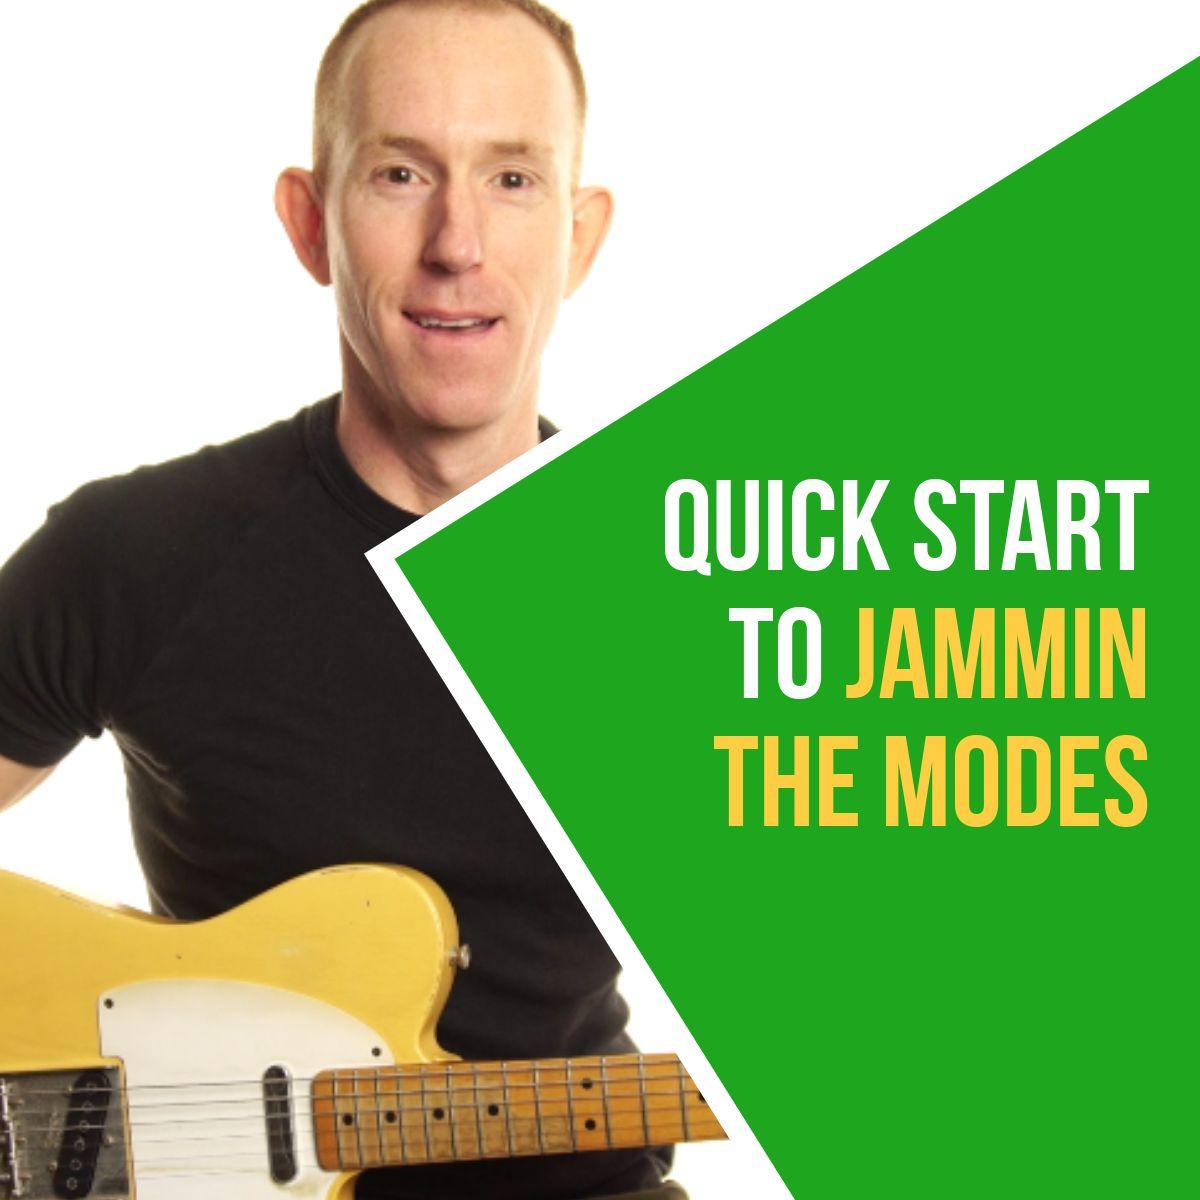 bonus-quick-start-modes